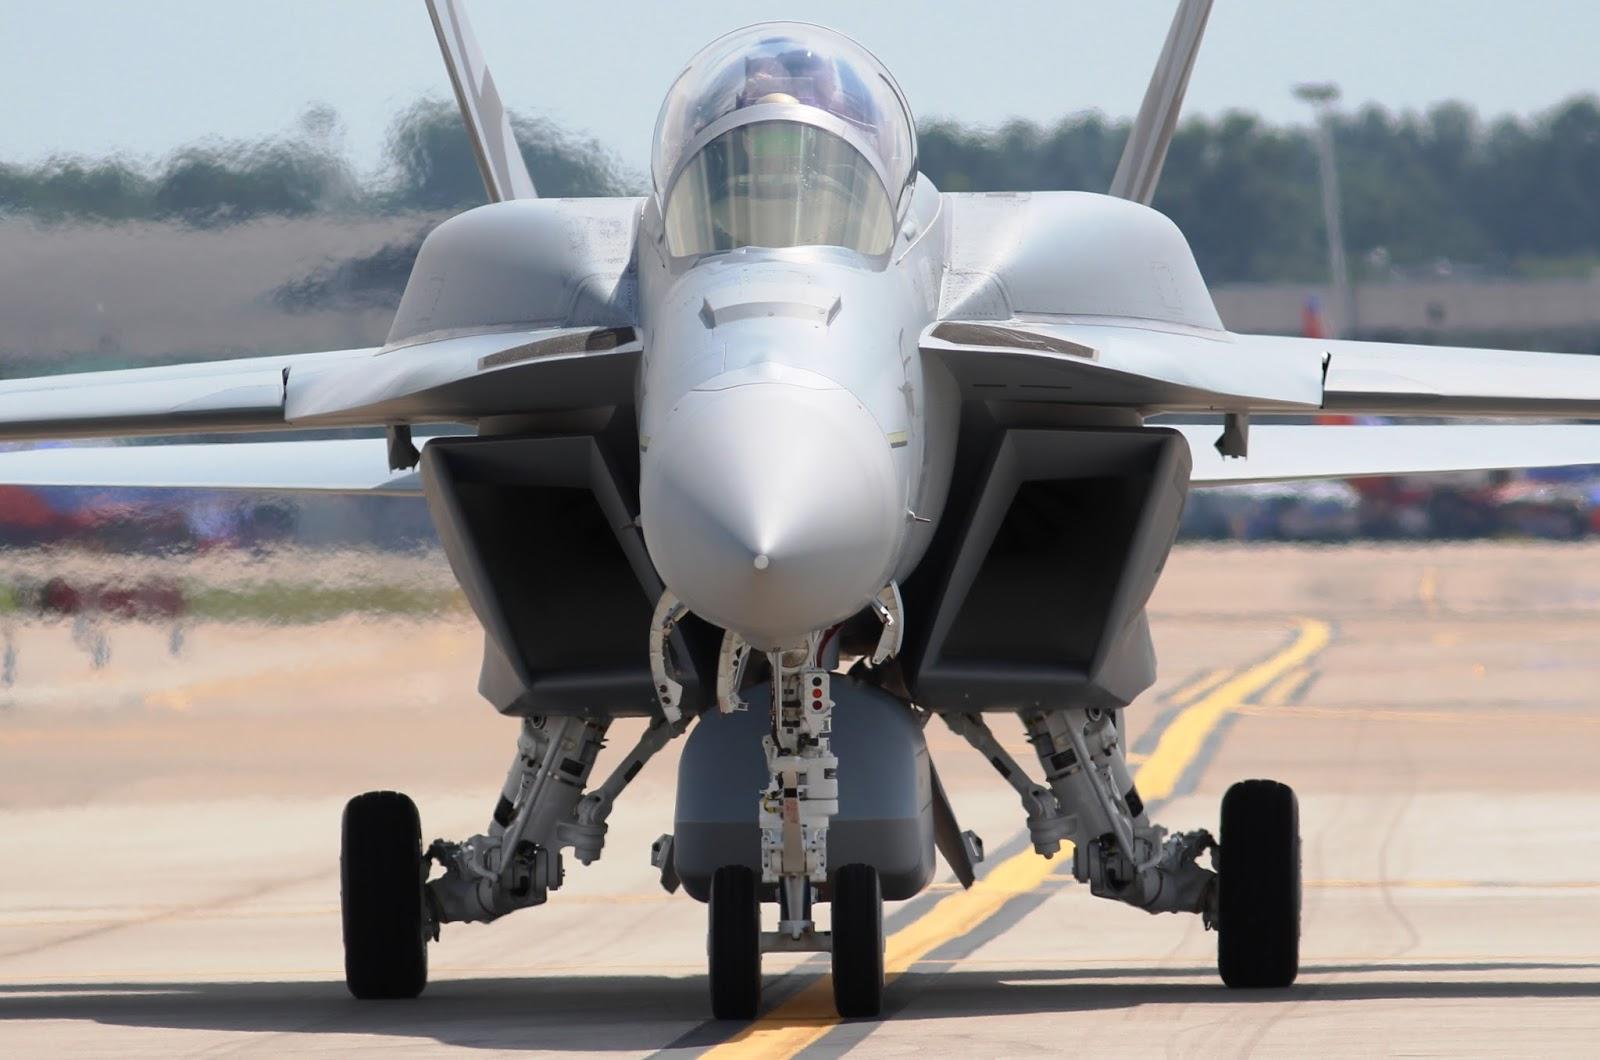 F 18 Advanced Super Hornet The Aero Experience: A...